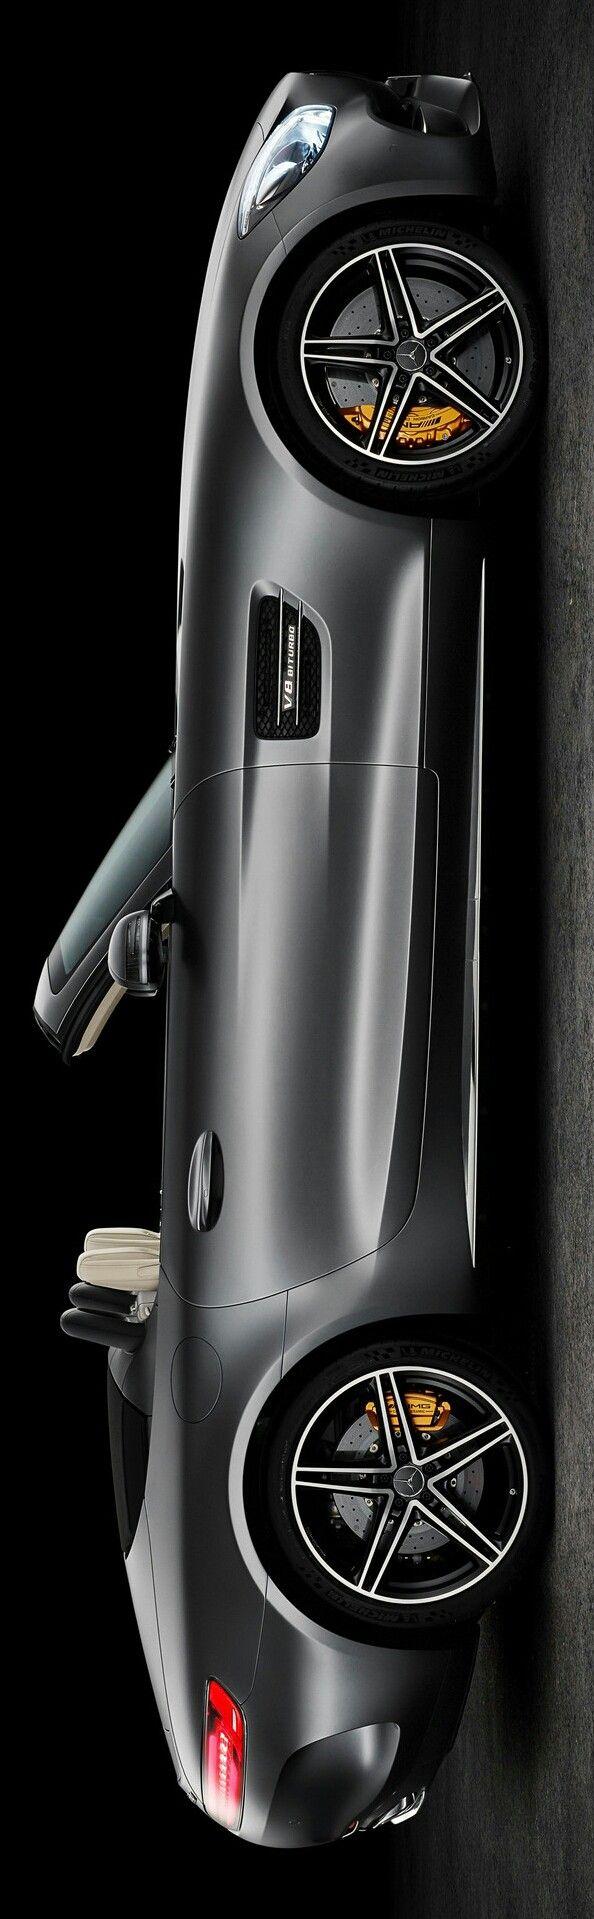 2016 Mercedes-AMG GT C Roadster by Levon